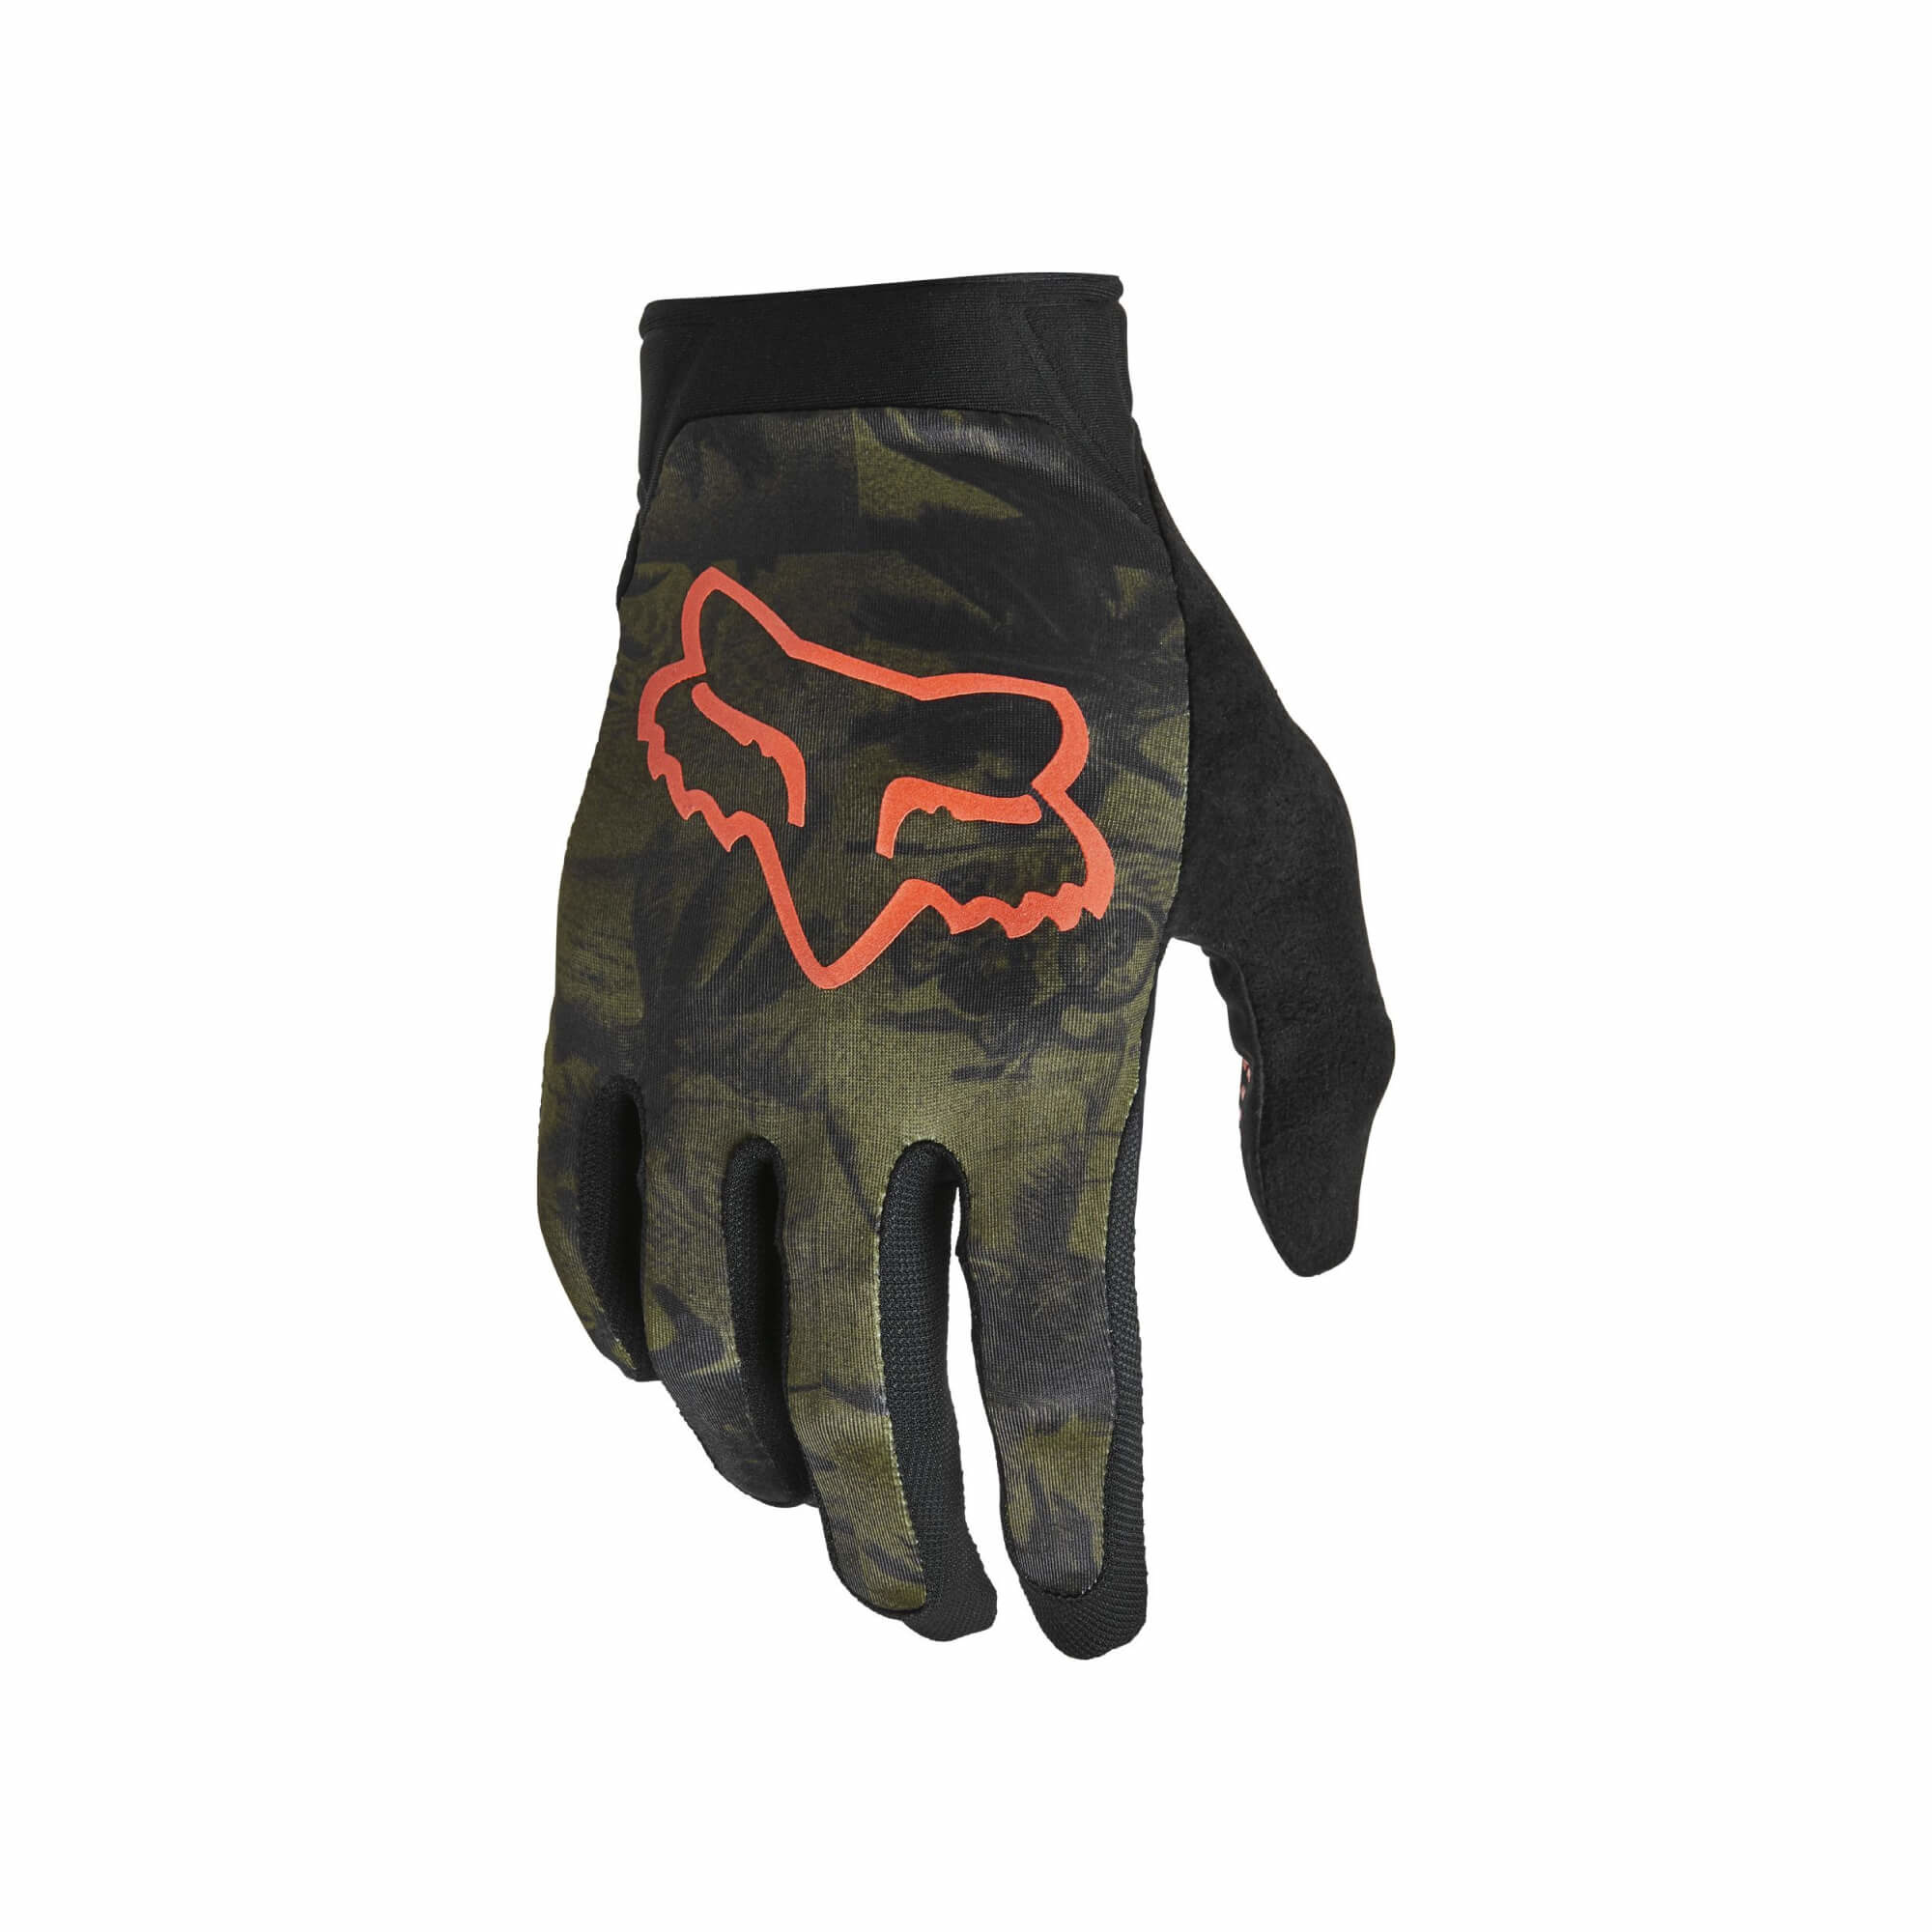 Flexair Ascent Glove Adv 2021-1